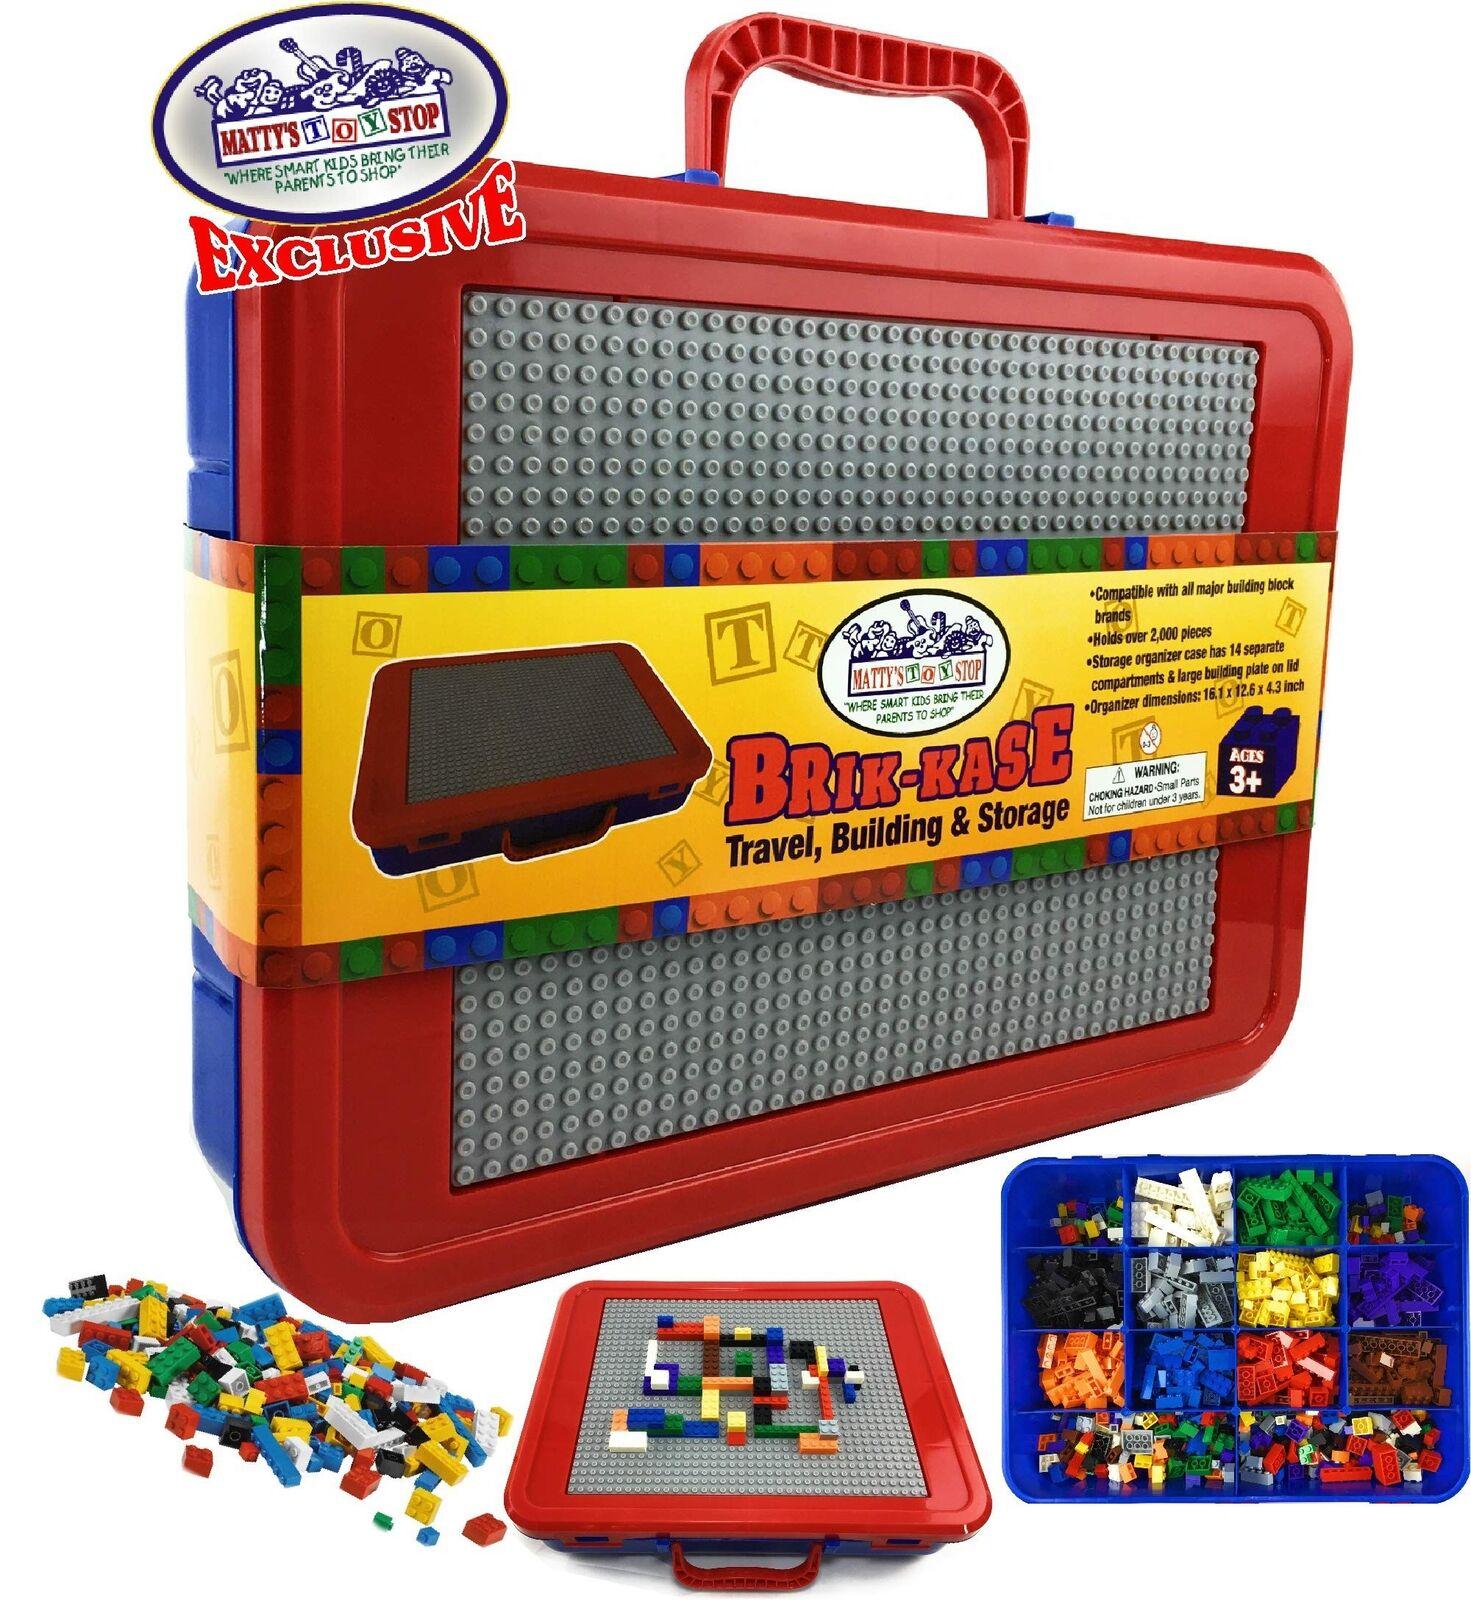 Brik-Kase Brik-Kase Brik-Kase Lego Travel, Storage & Organizer  Case w Building Plate Lid - bluee,... d52401